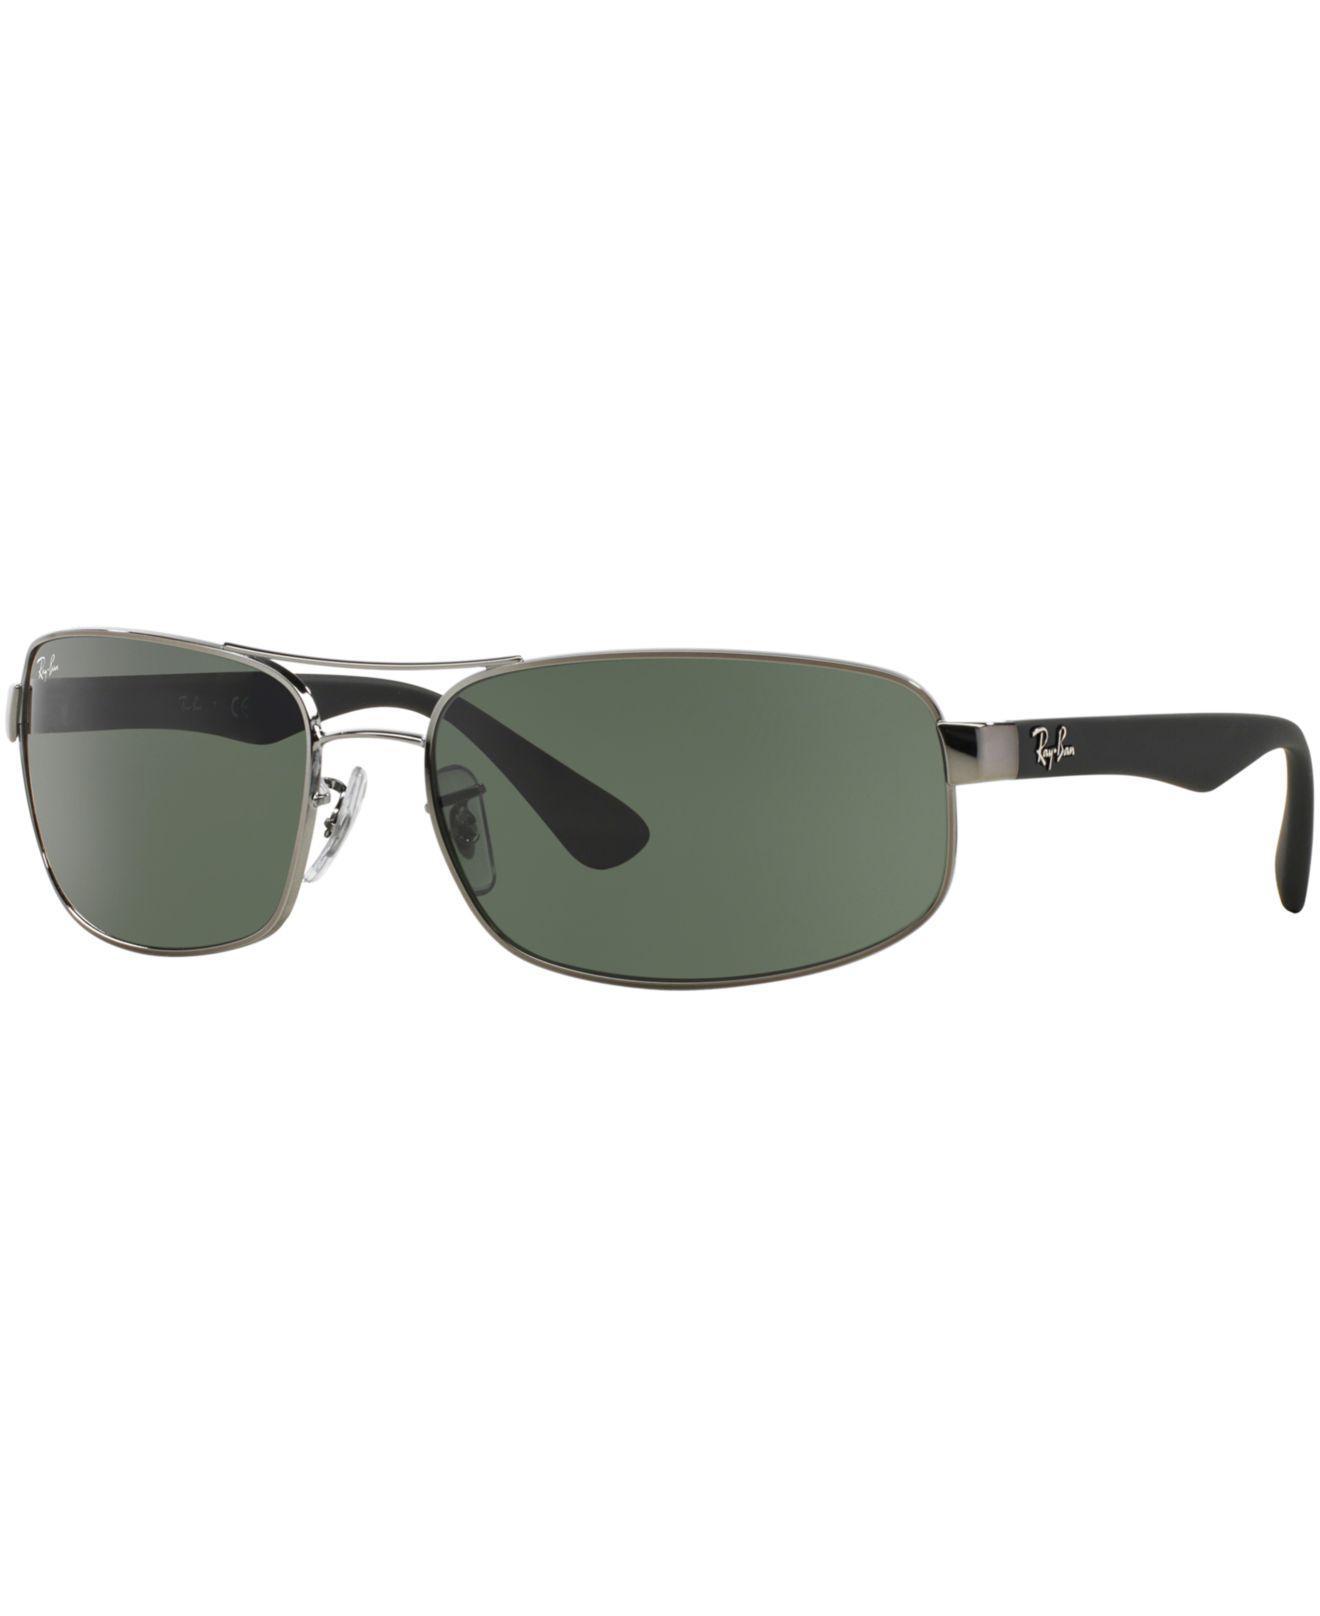 edceaf0d9aa9 Lyst - Ray-Ban Sunglasses, Rb3445 for Men